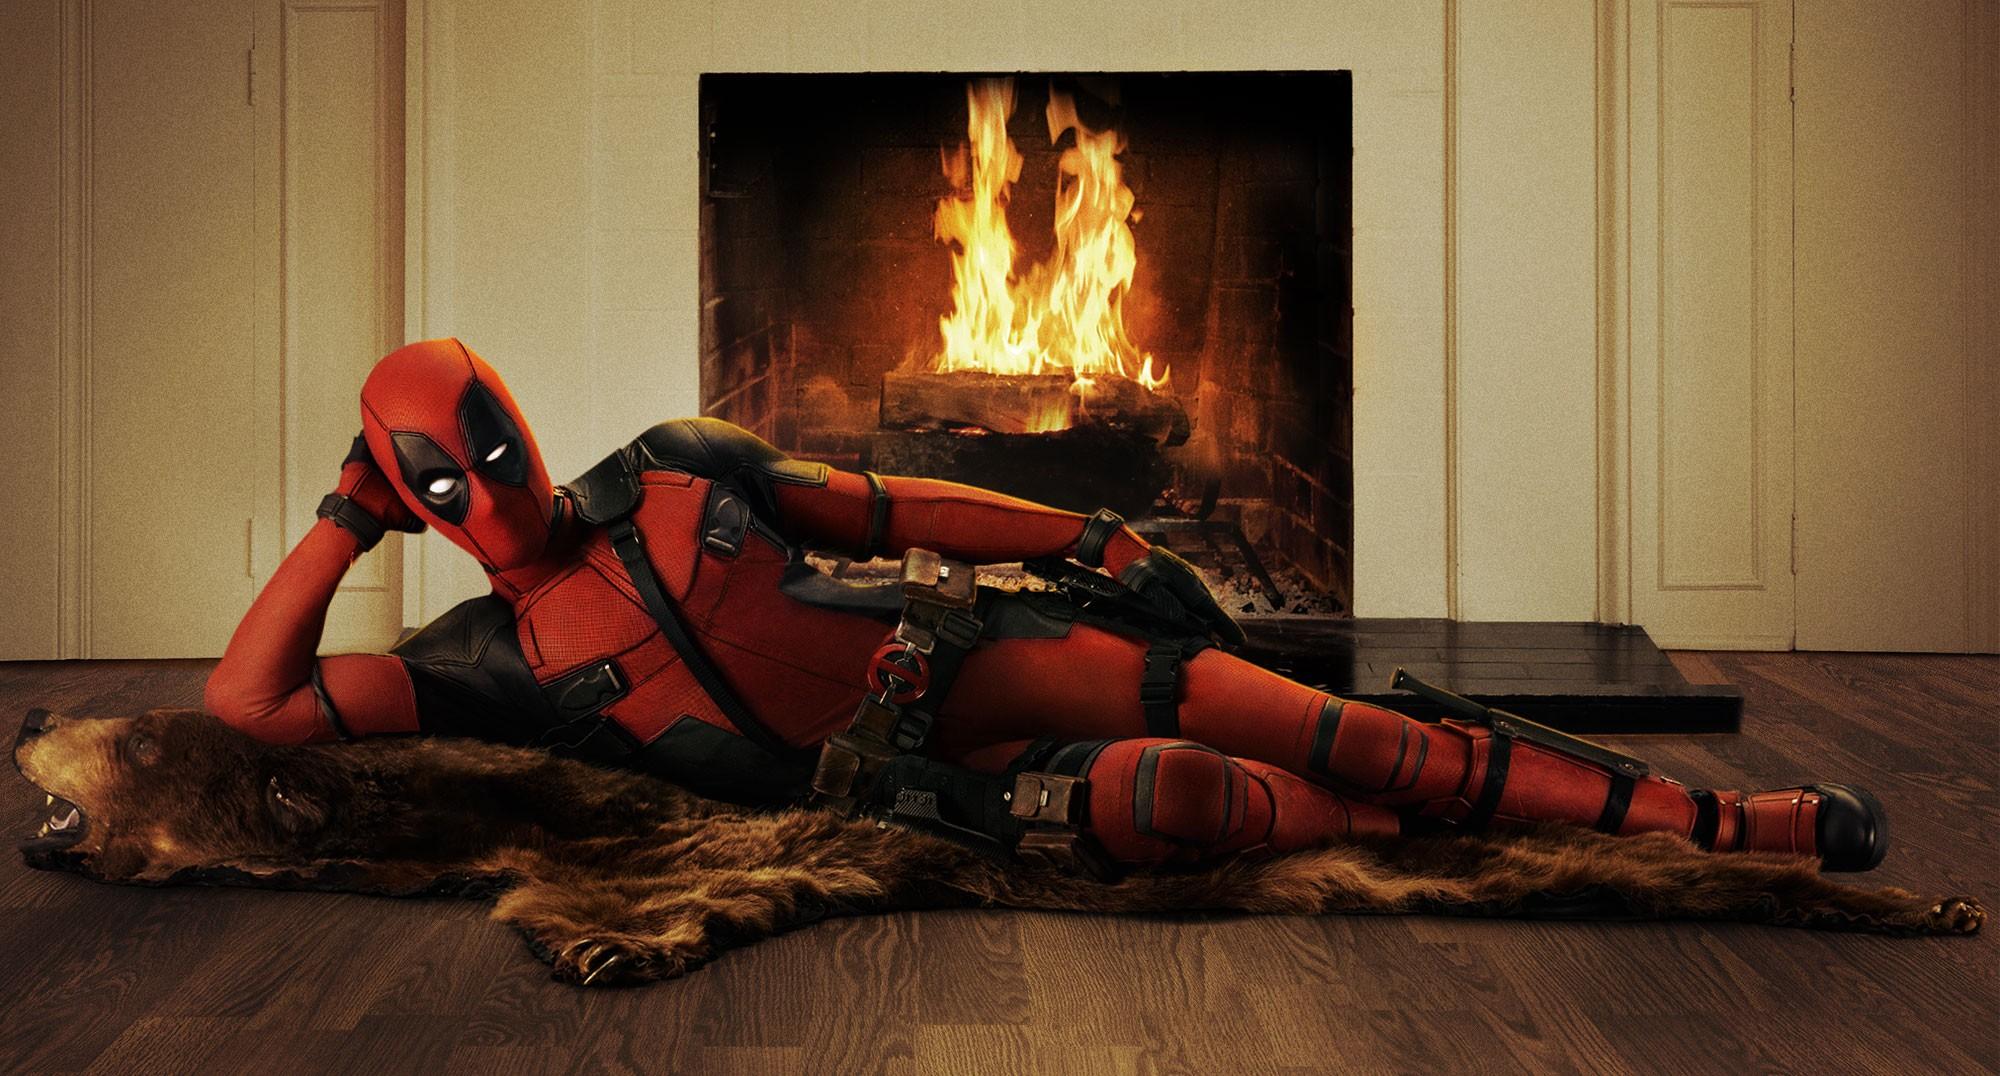 DEADPOOL relaxing by the fireside. (20th Century Fox)